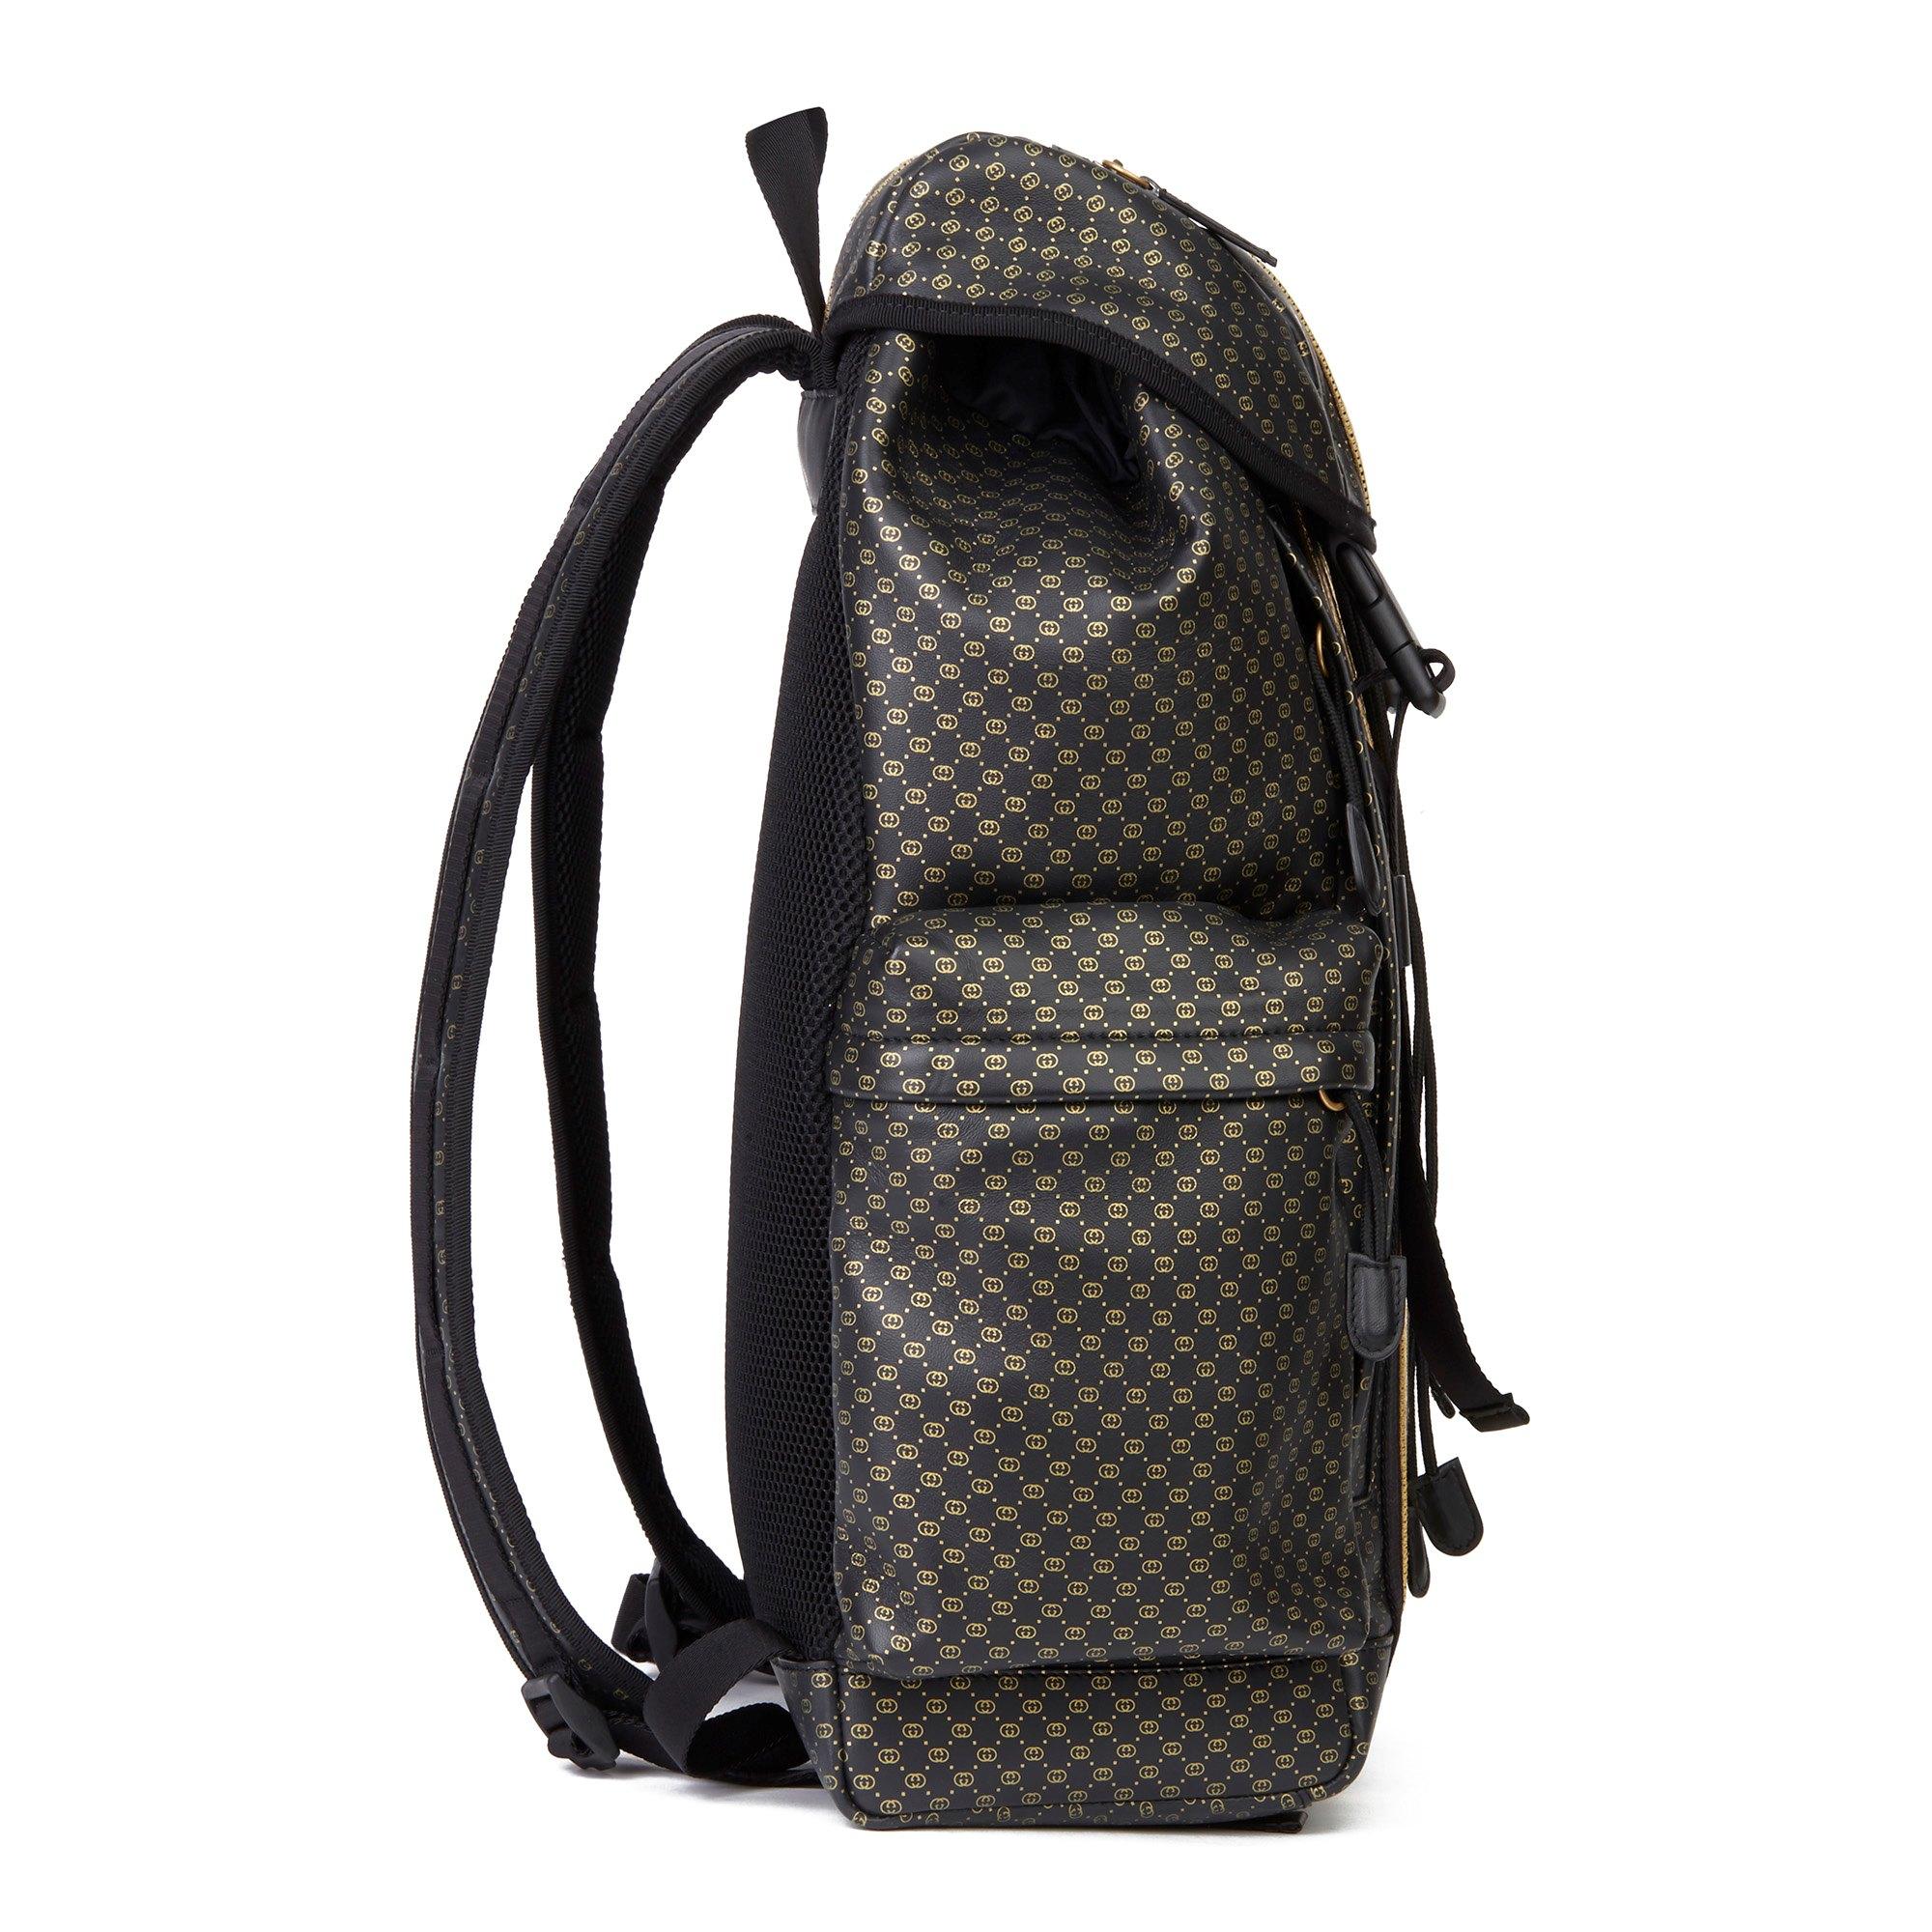 Gucci Black & Gold Monogram Calfskin Leather & Gold Python Leather Dapper Dan Backpack